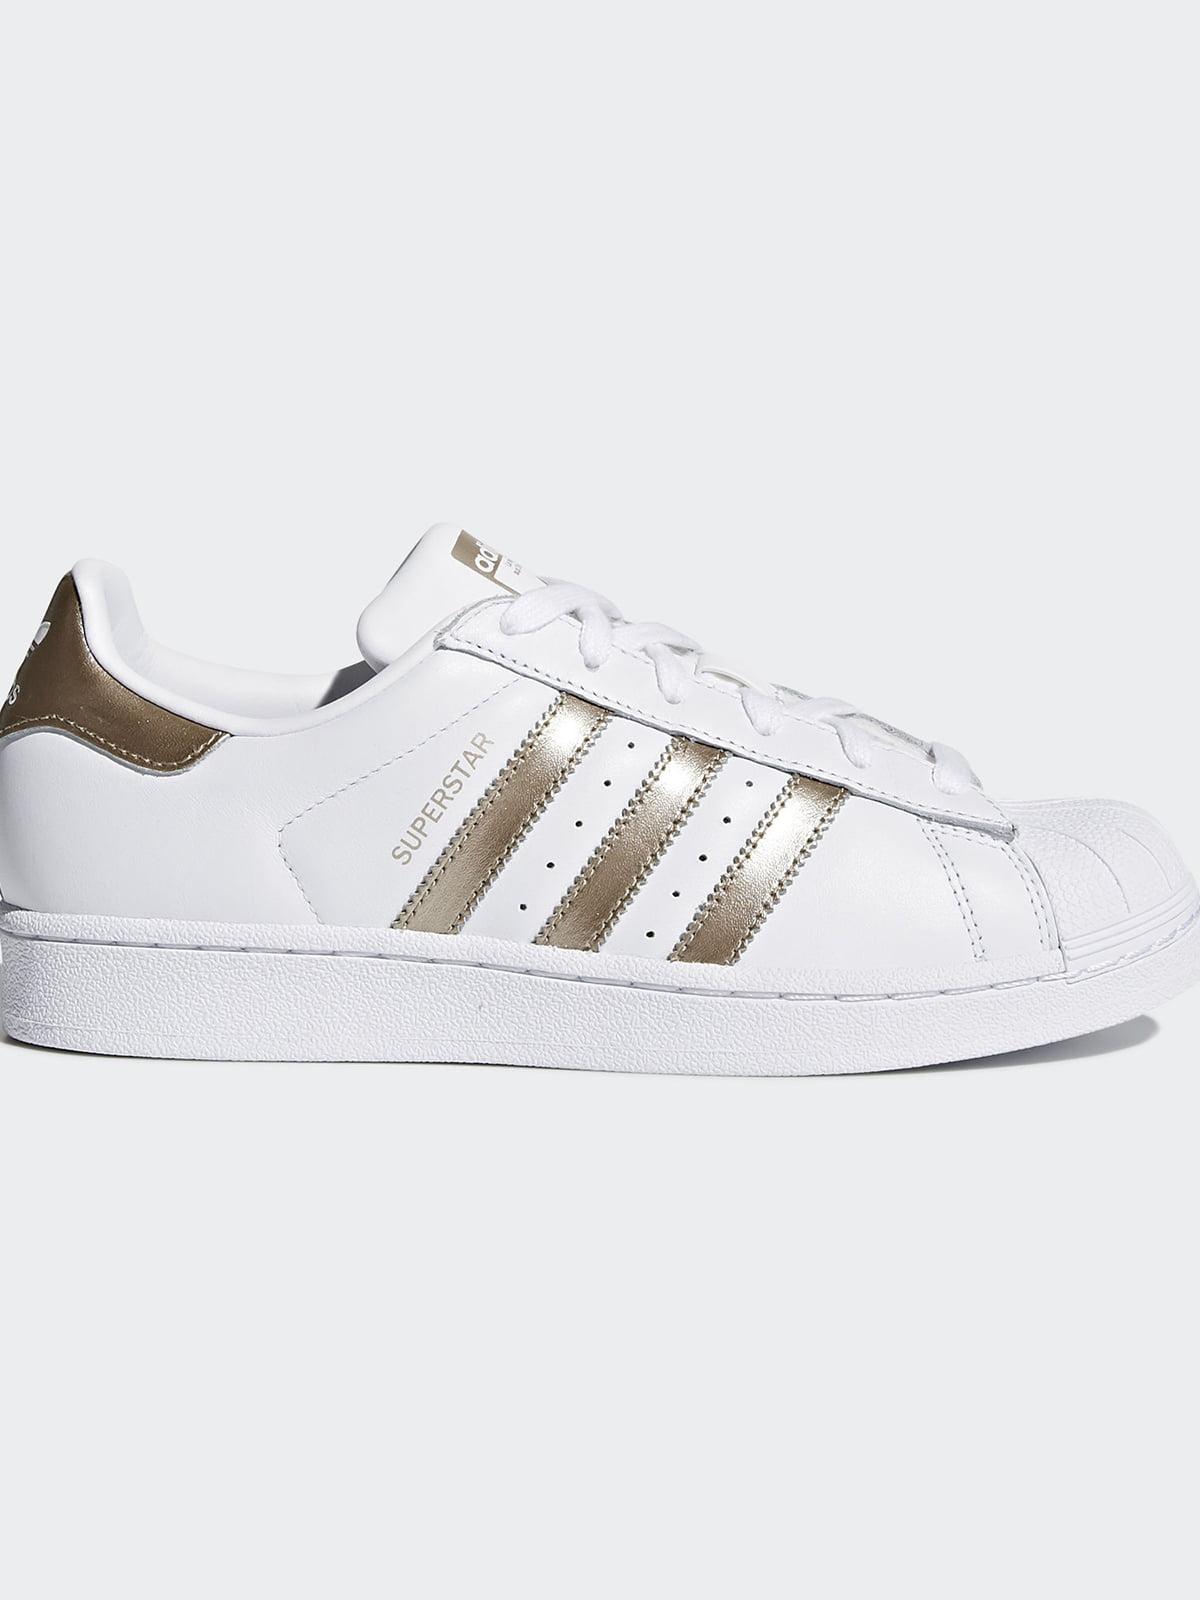 Кросівки білі — Adidas Originals 07935578fa7aa